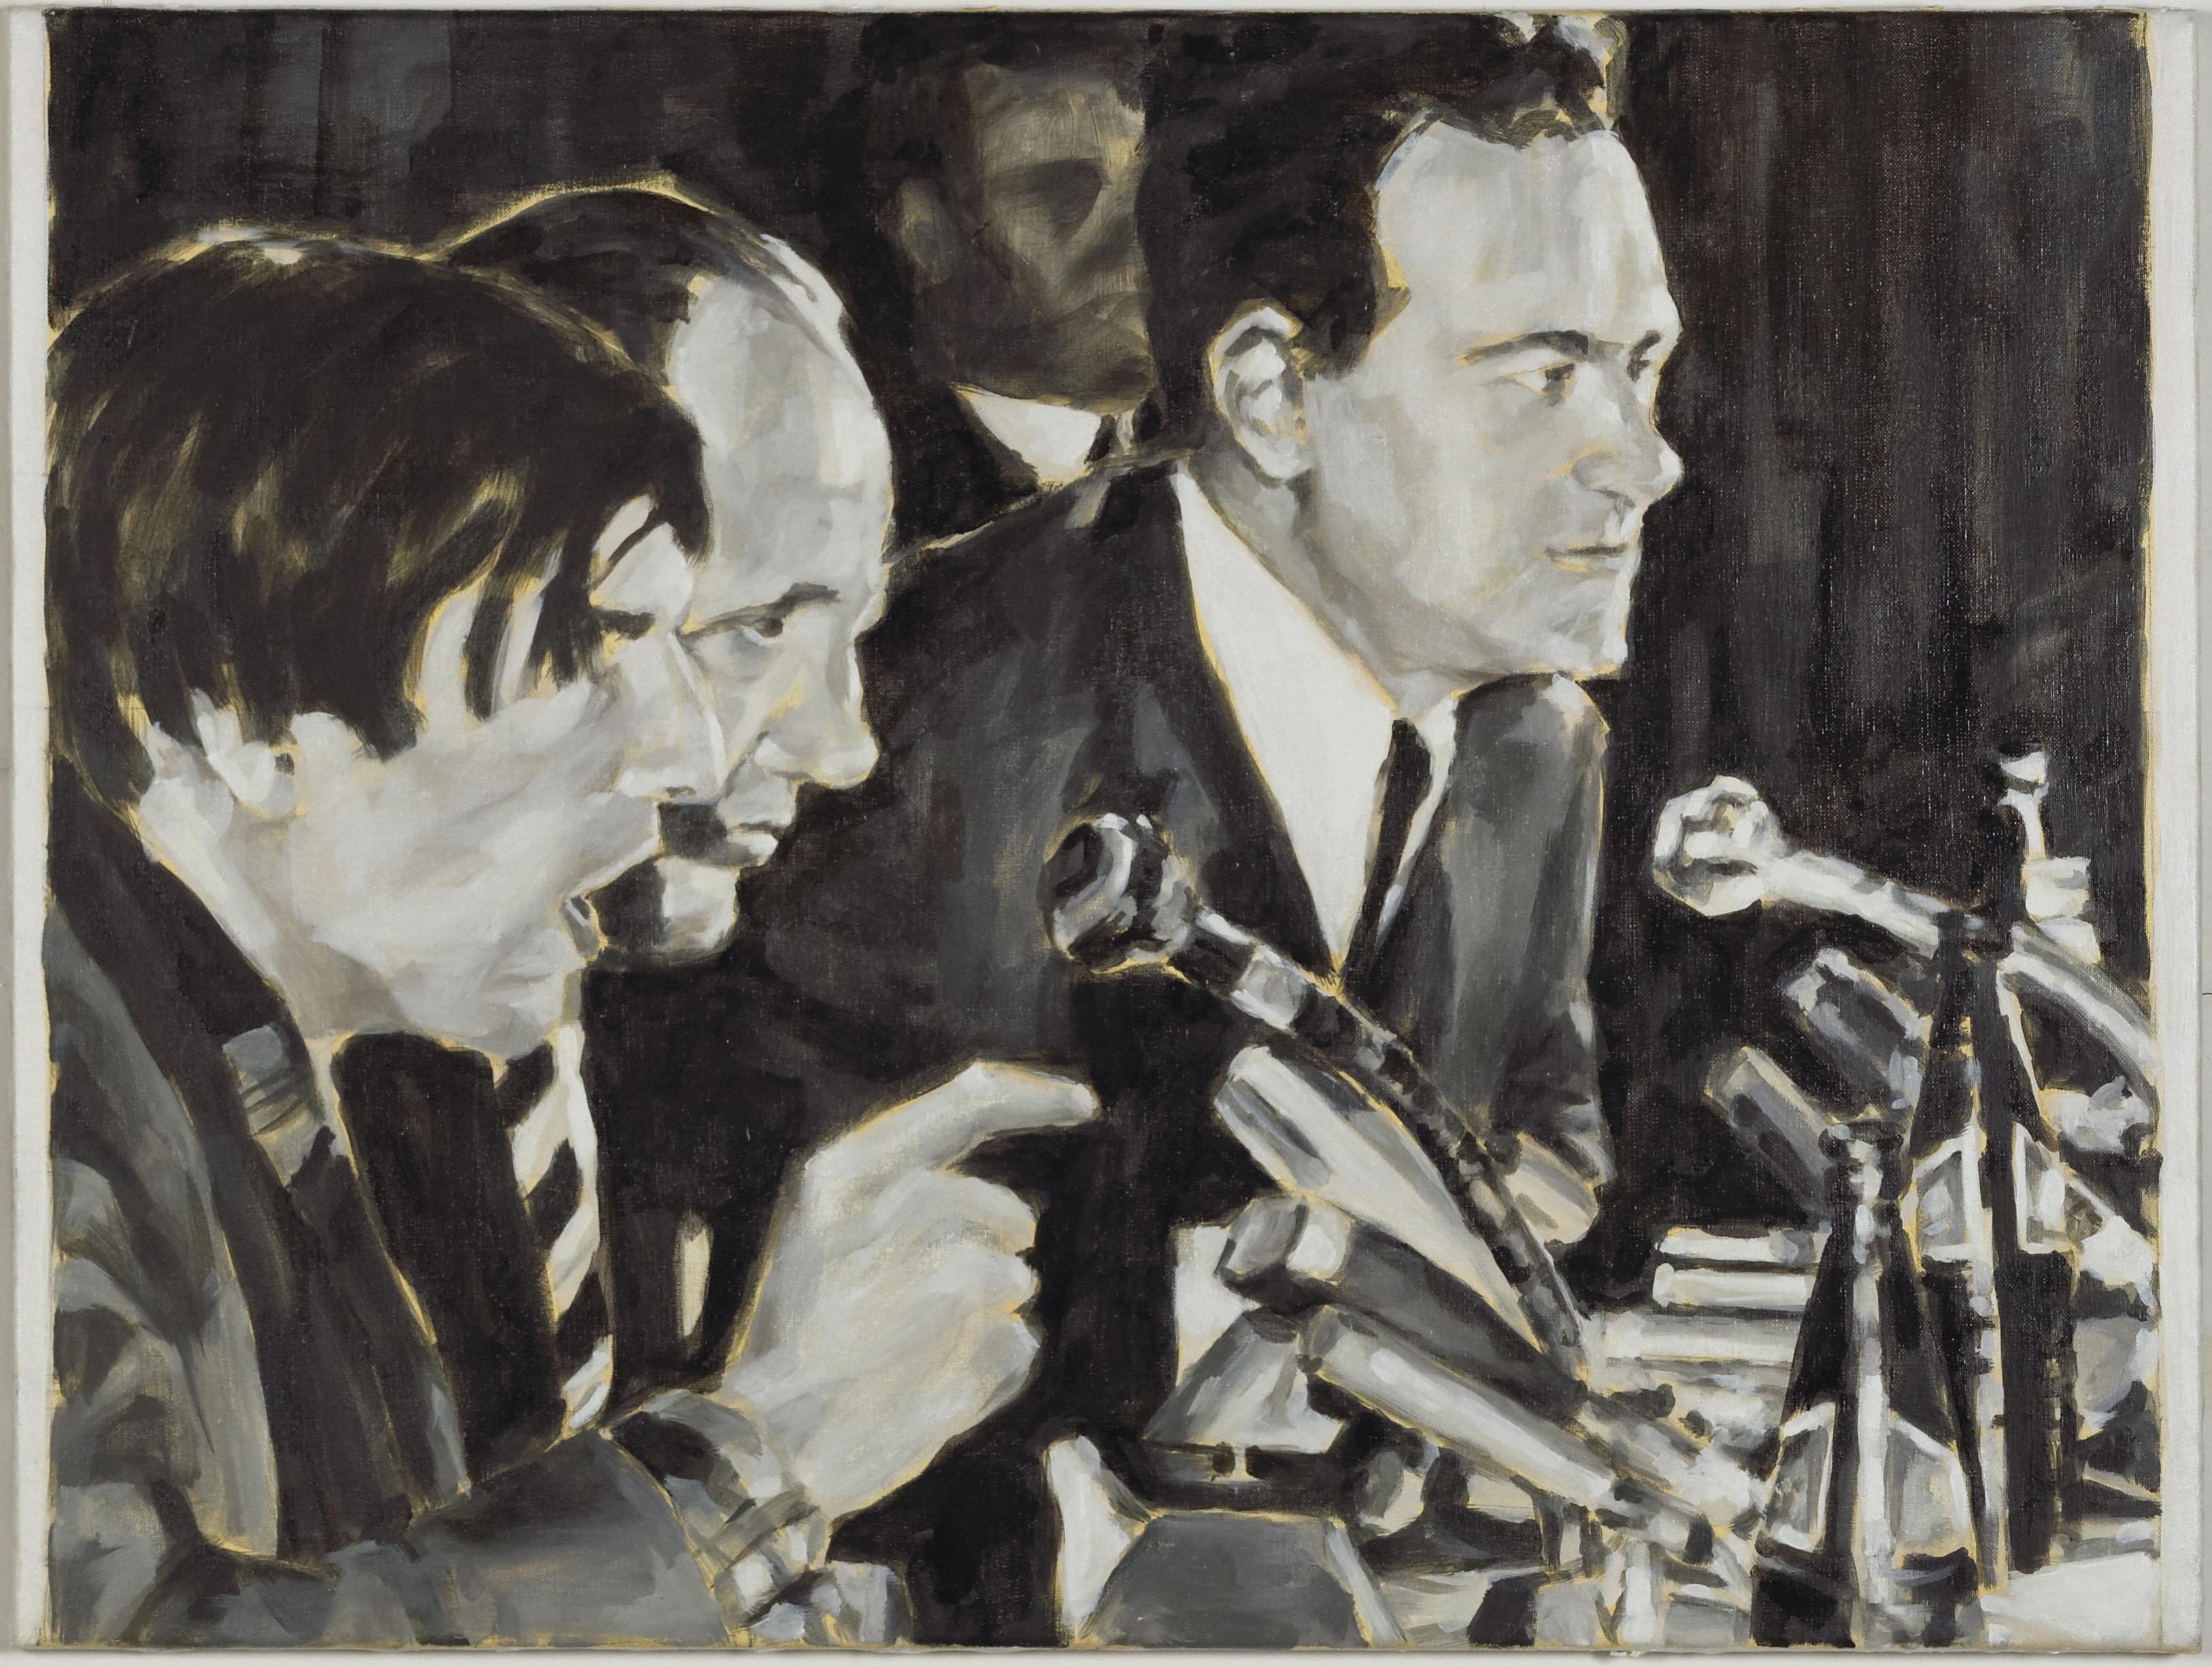 """Diskussion"", Öl auf Leinwand, 70 x 100 cm, 2007"